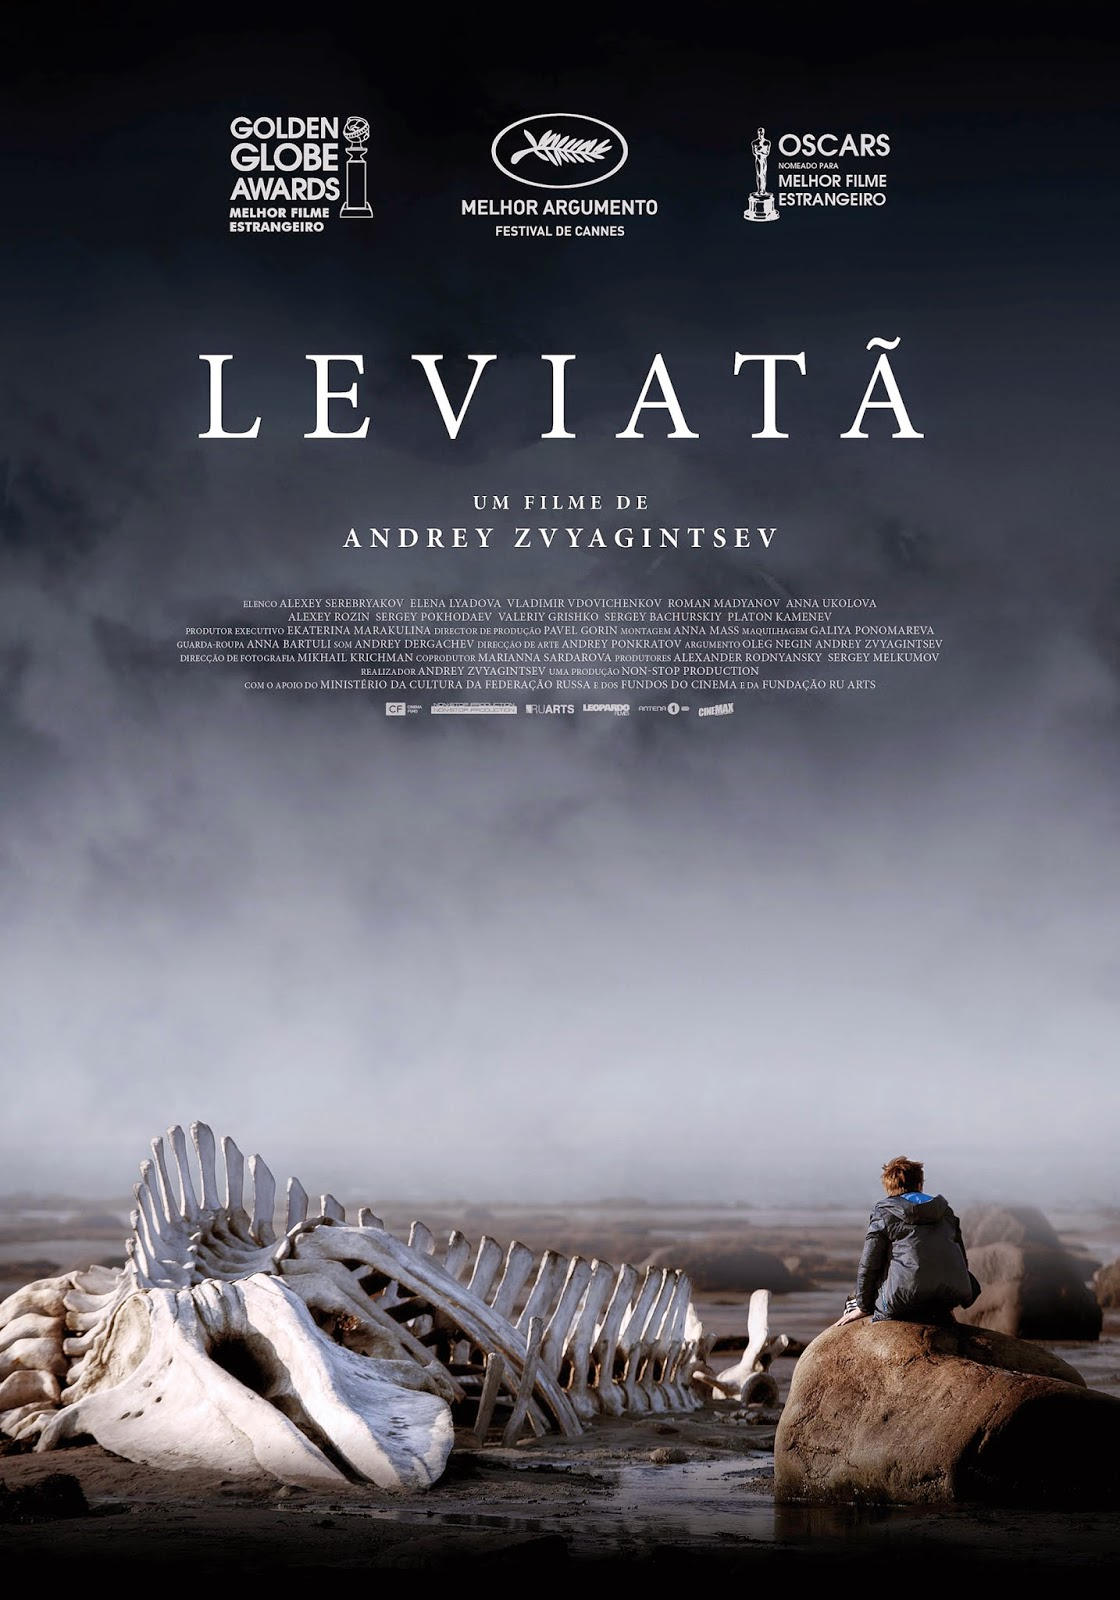 Leviatã - Leviafan (2014)